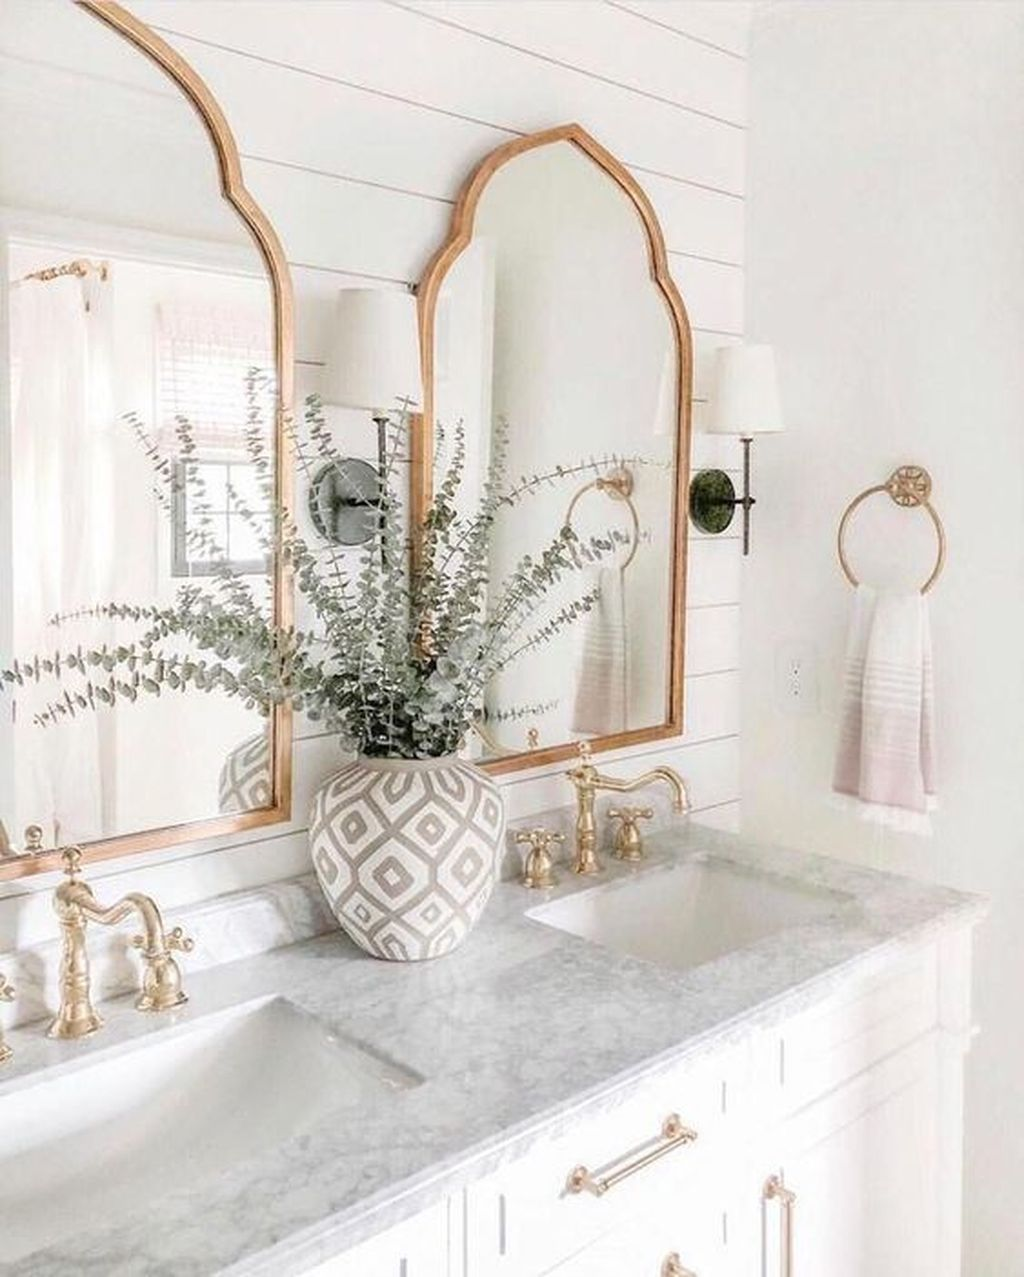 bathroom decor sets #bathroom decor above toilet #bathroom decor